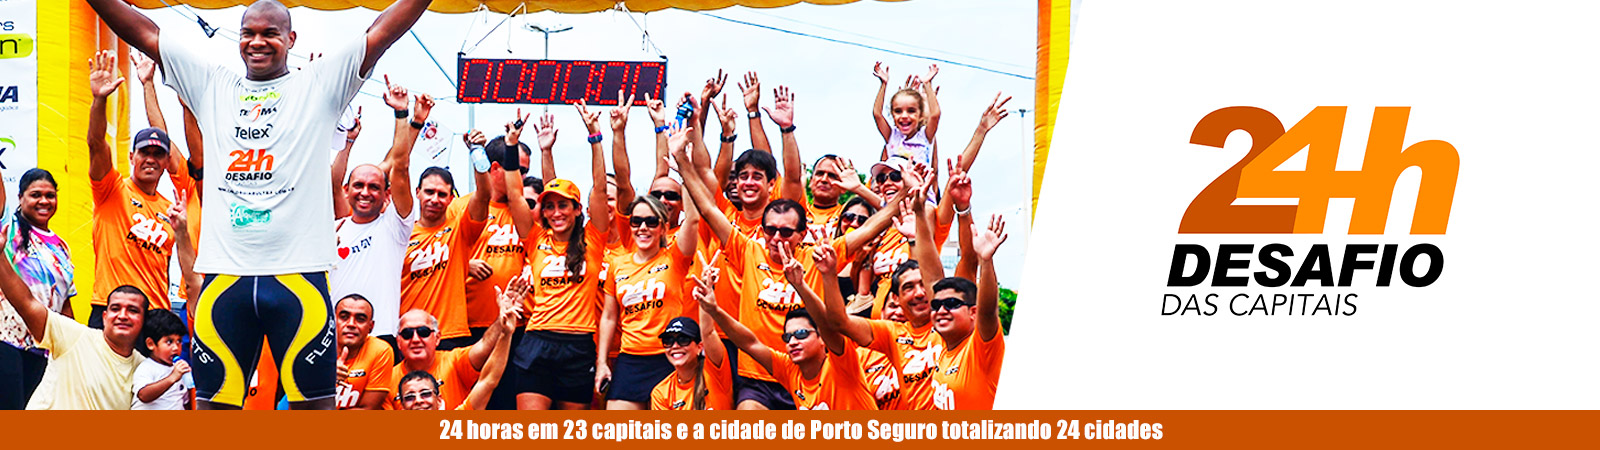 DESAFIO 24 HORAS DAS CAPITAIS - ETAPA CAMPO GRANDE/MS - Imagem de topo